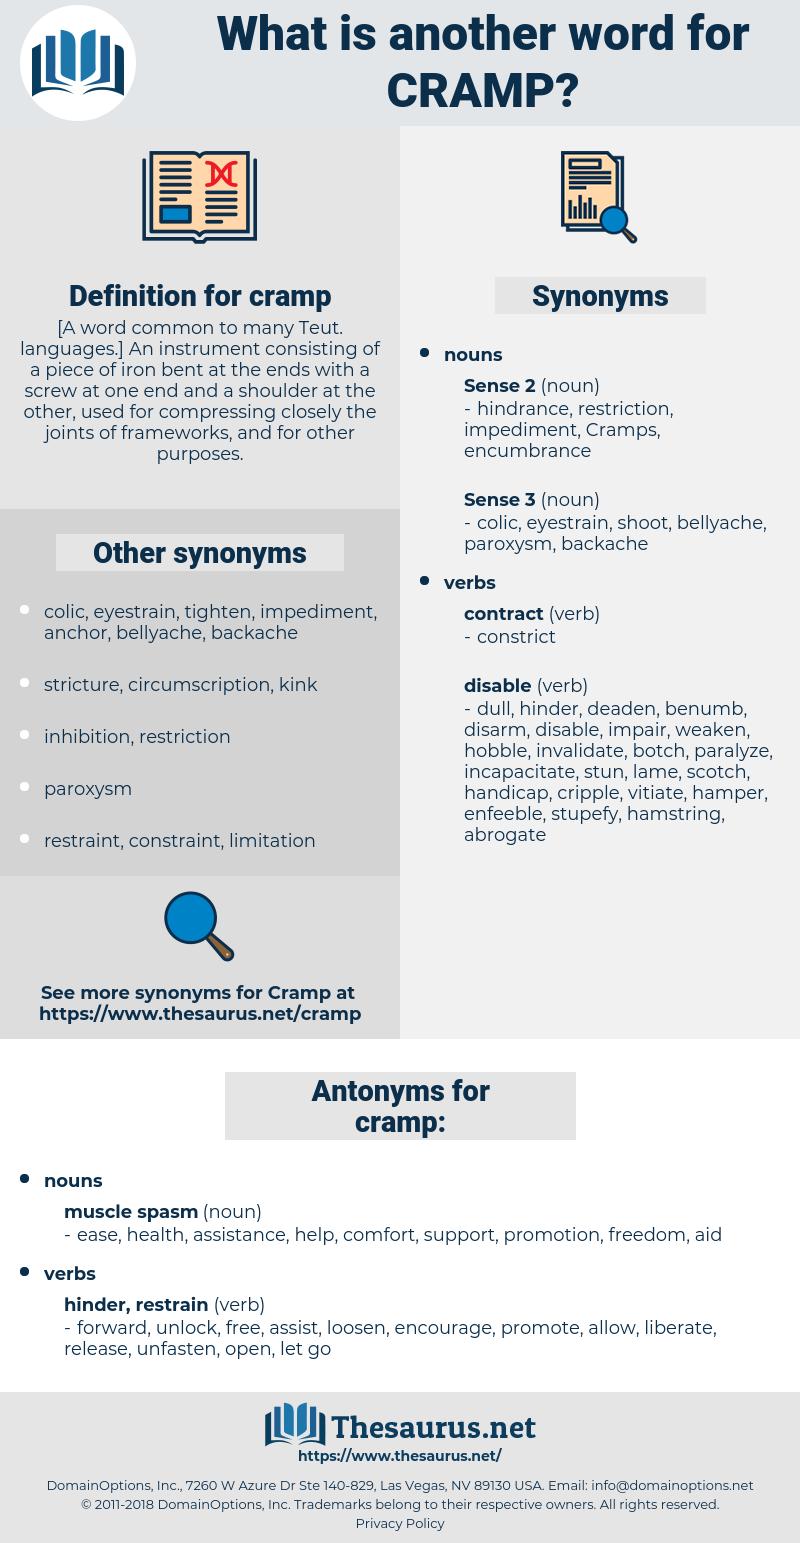 cramp, synonym cramp, another word for cramp, words like cramp, thesaurus cramp